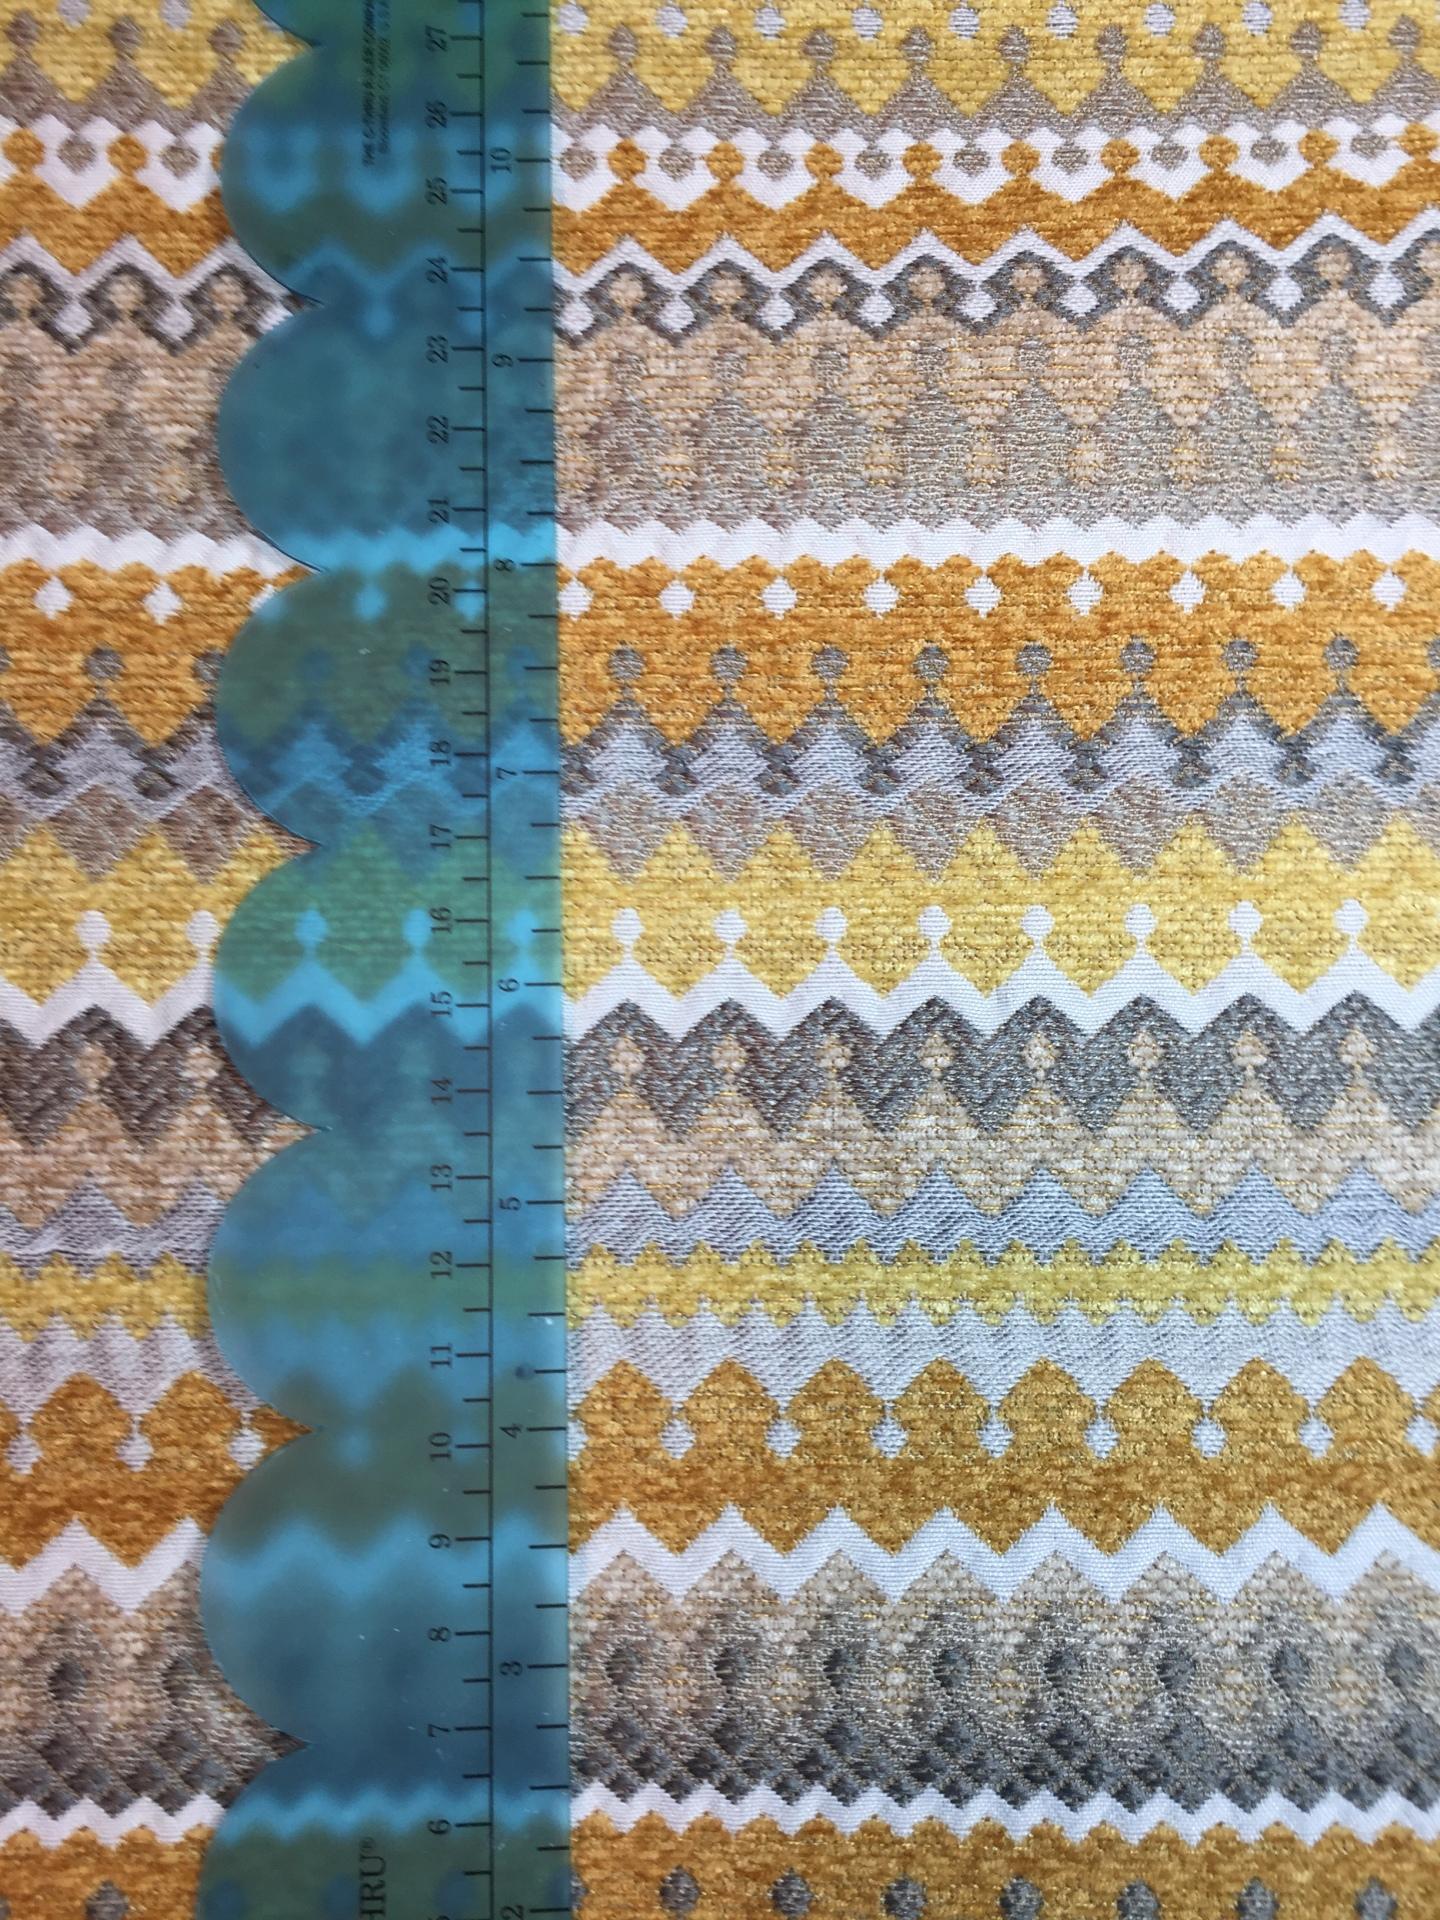 023 Stripes of Autumn - Mid